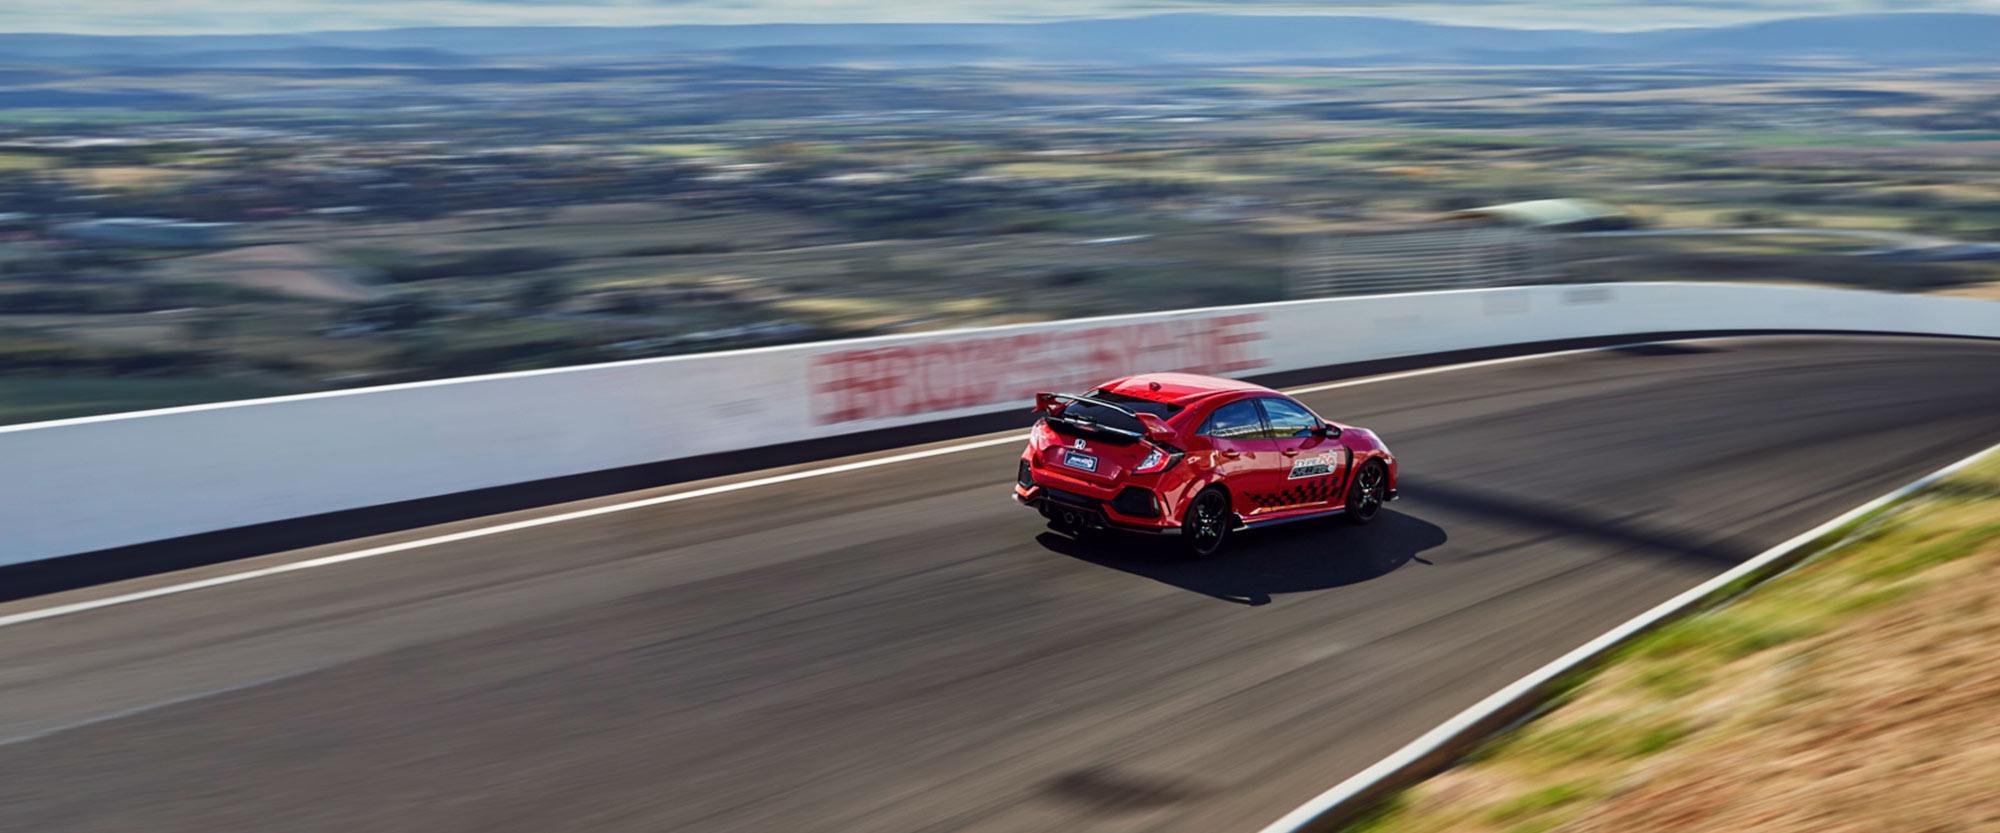 Jenson_Button_Bathurst_Honda_Civic_Type_R_0006